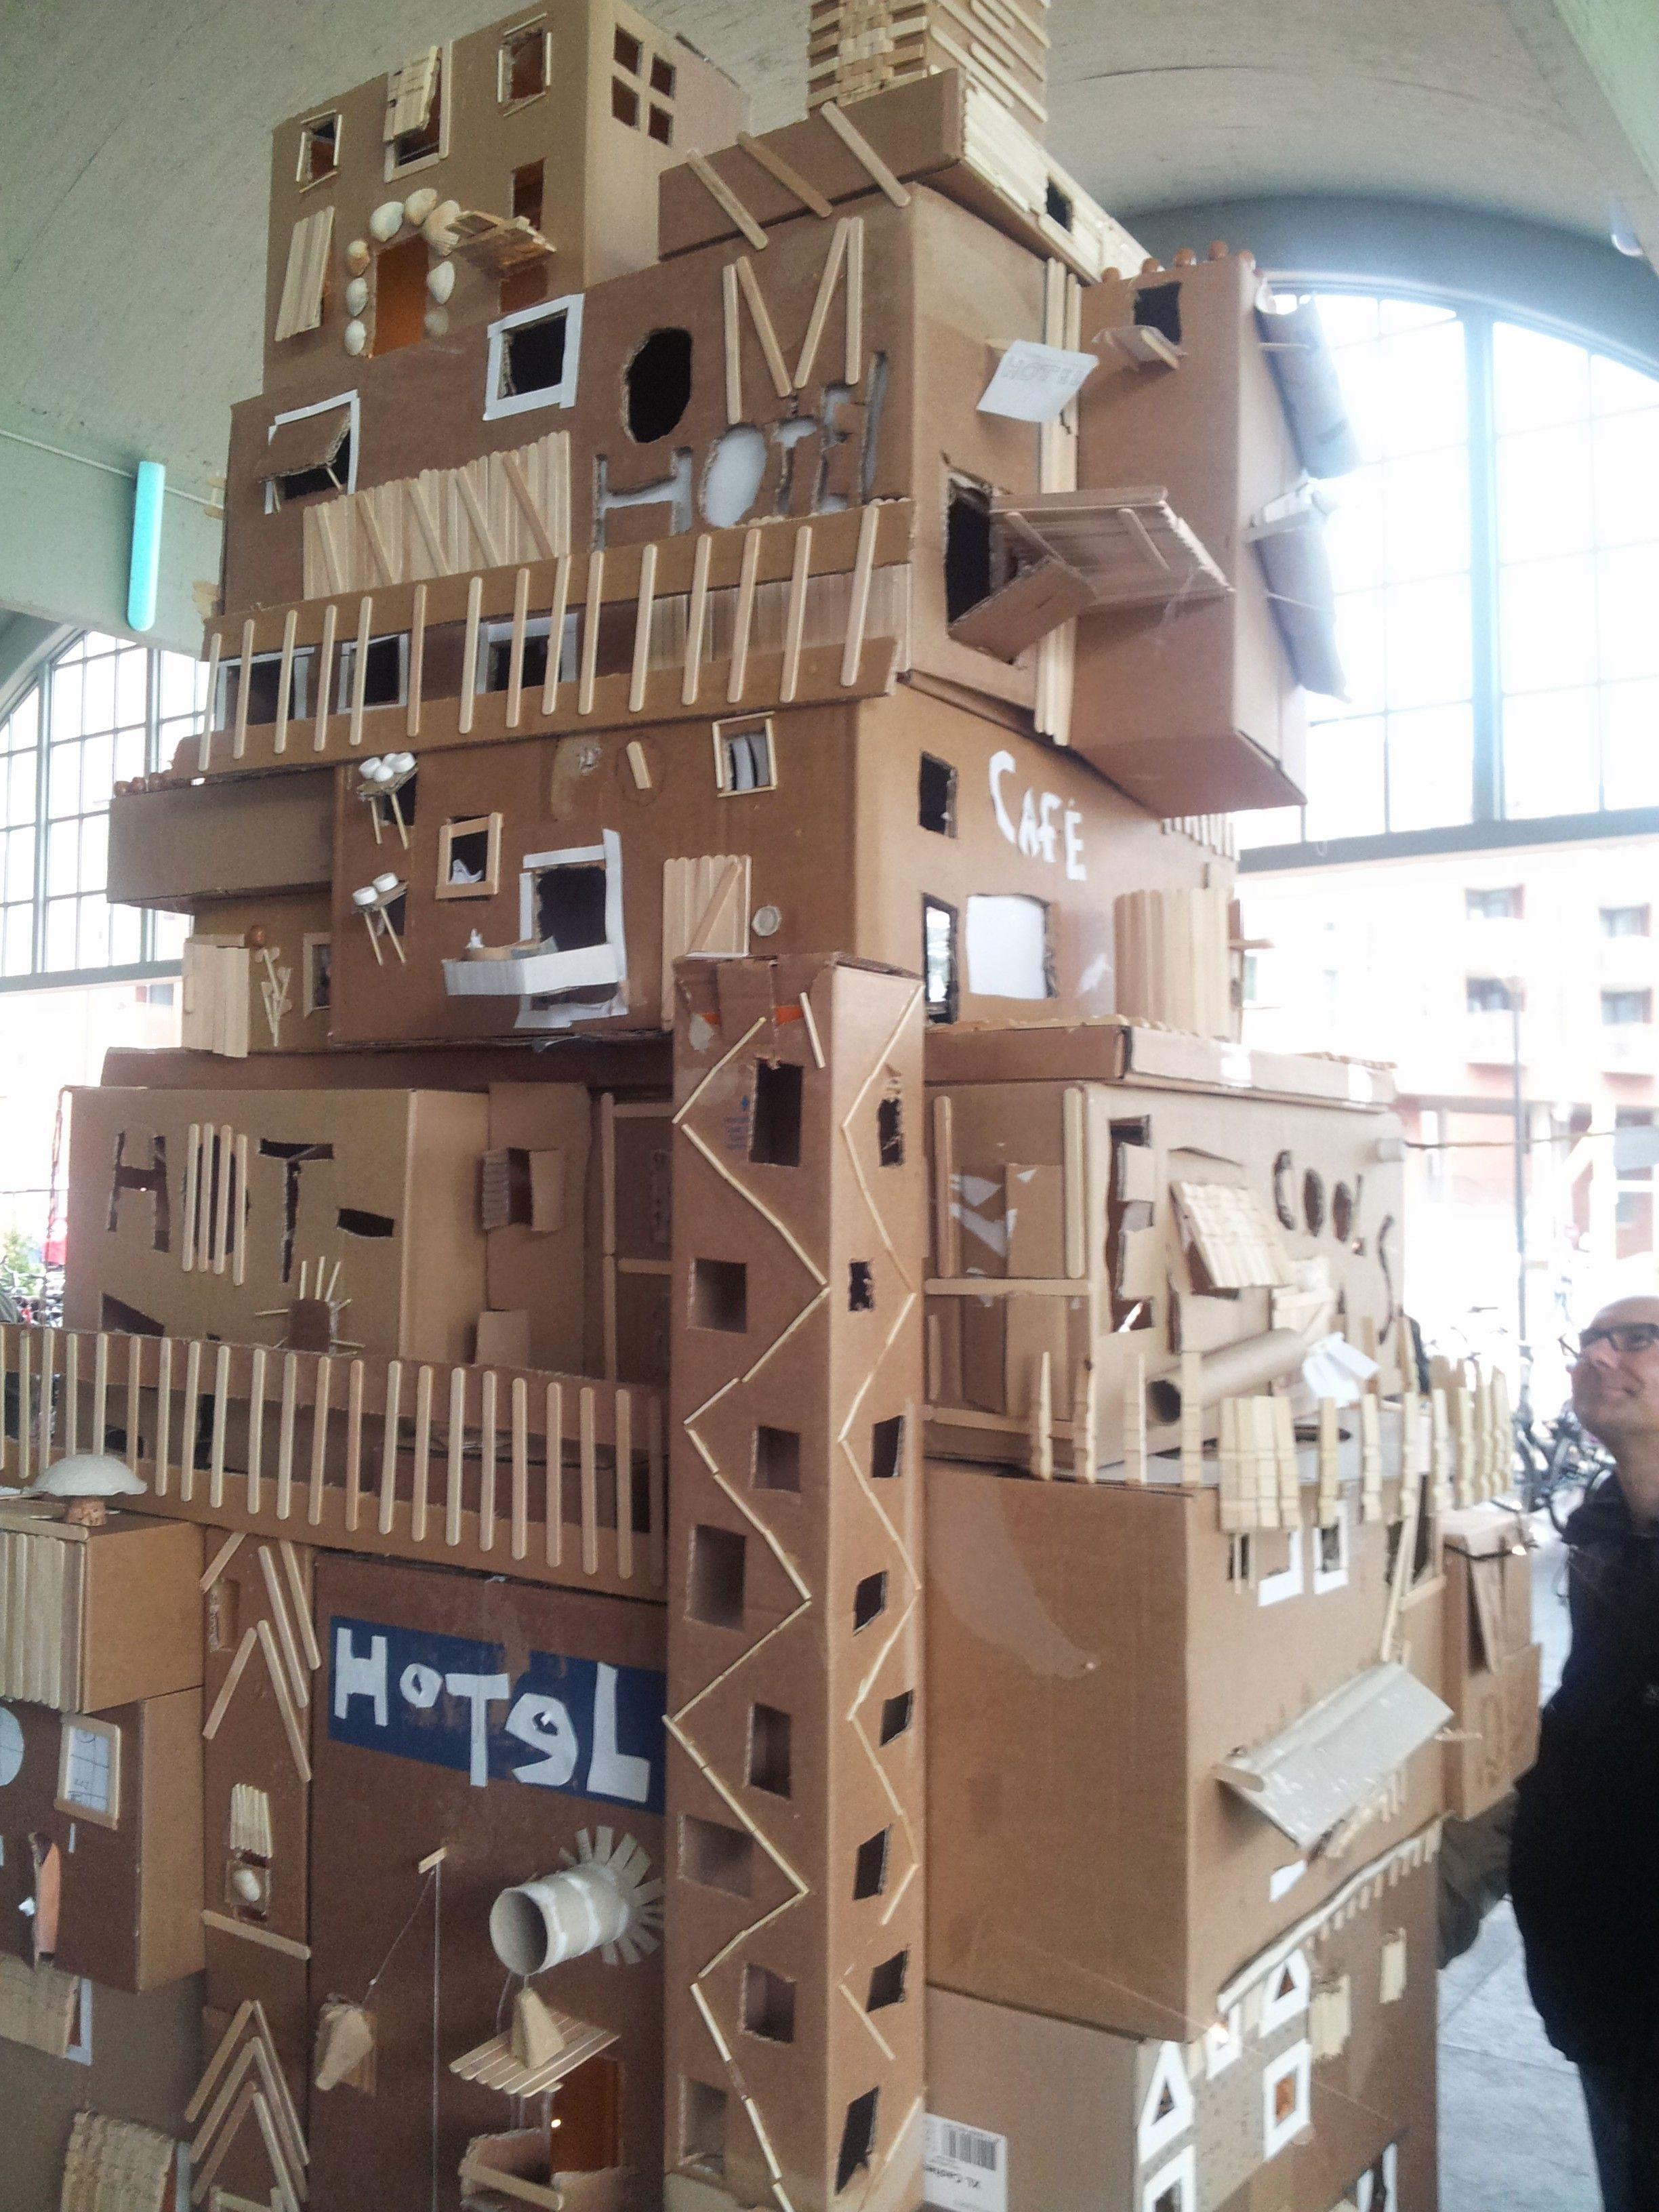 School Art Project Cardboard Box Houses Building Blocks